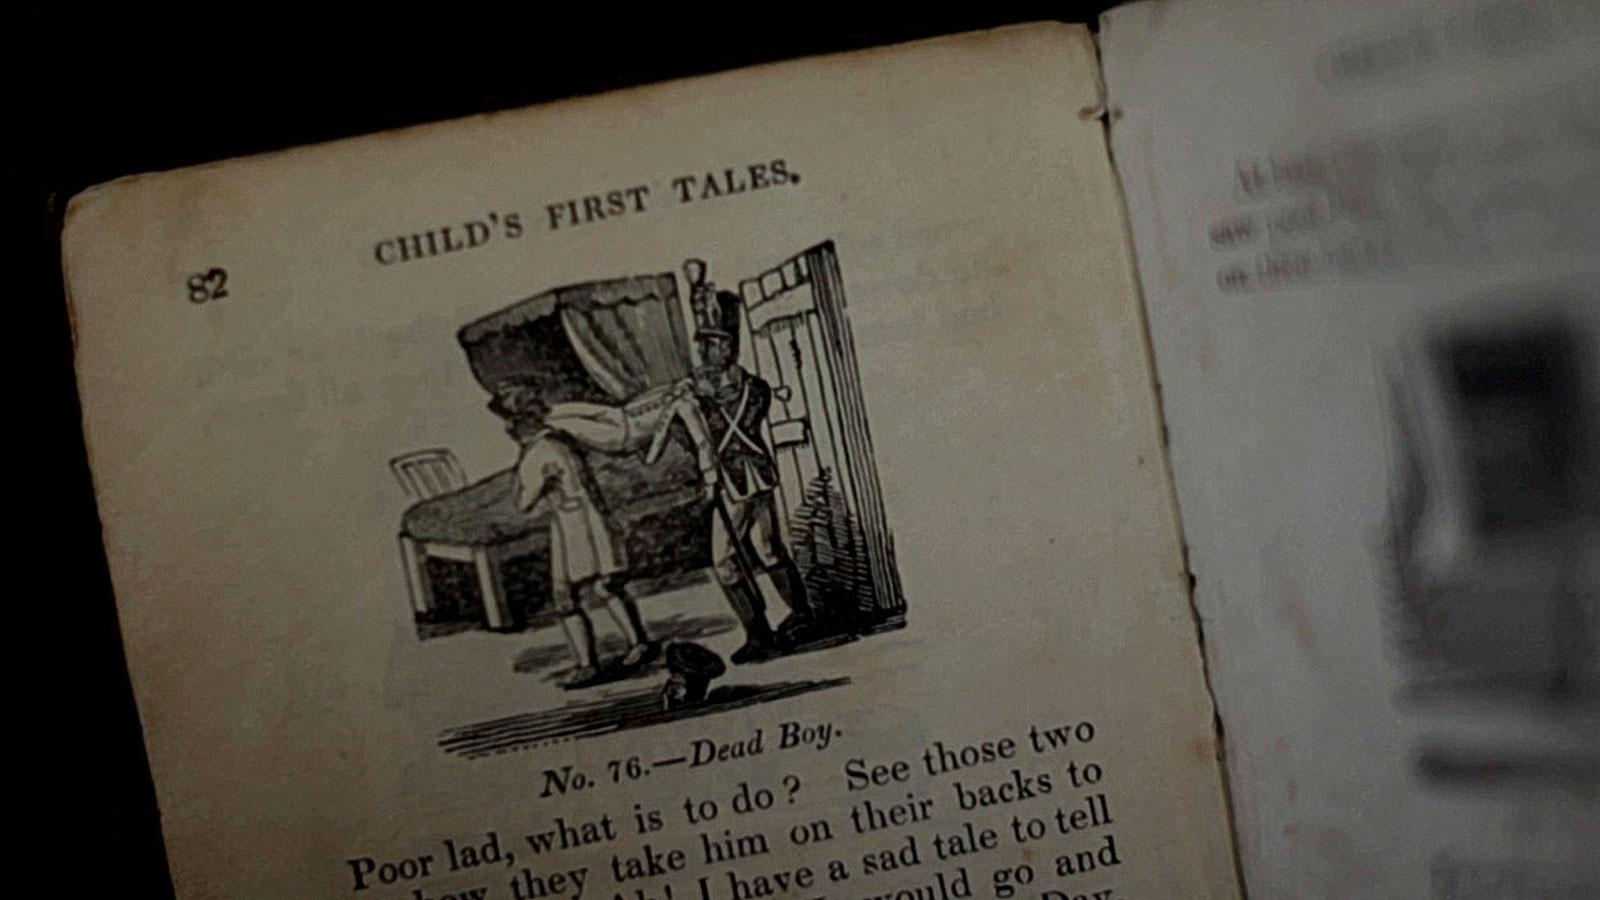 Jane Eyre - Childhood